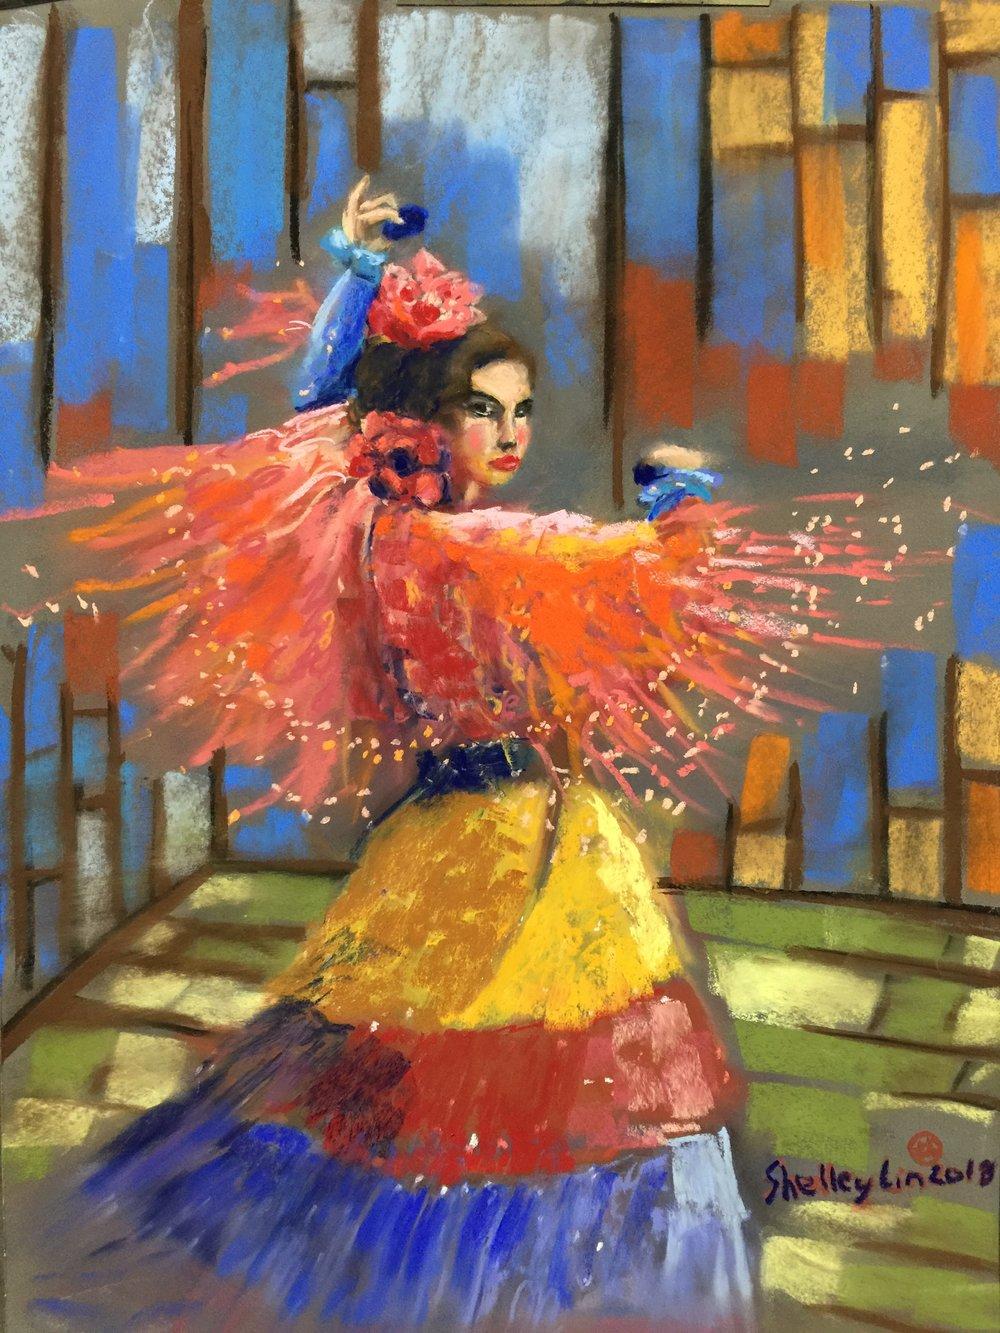 YUYUNG LIN Title: Dancing Gypsy woman Size: 55cm x 38cm x 0.1cm Price: $700